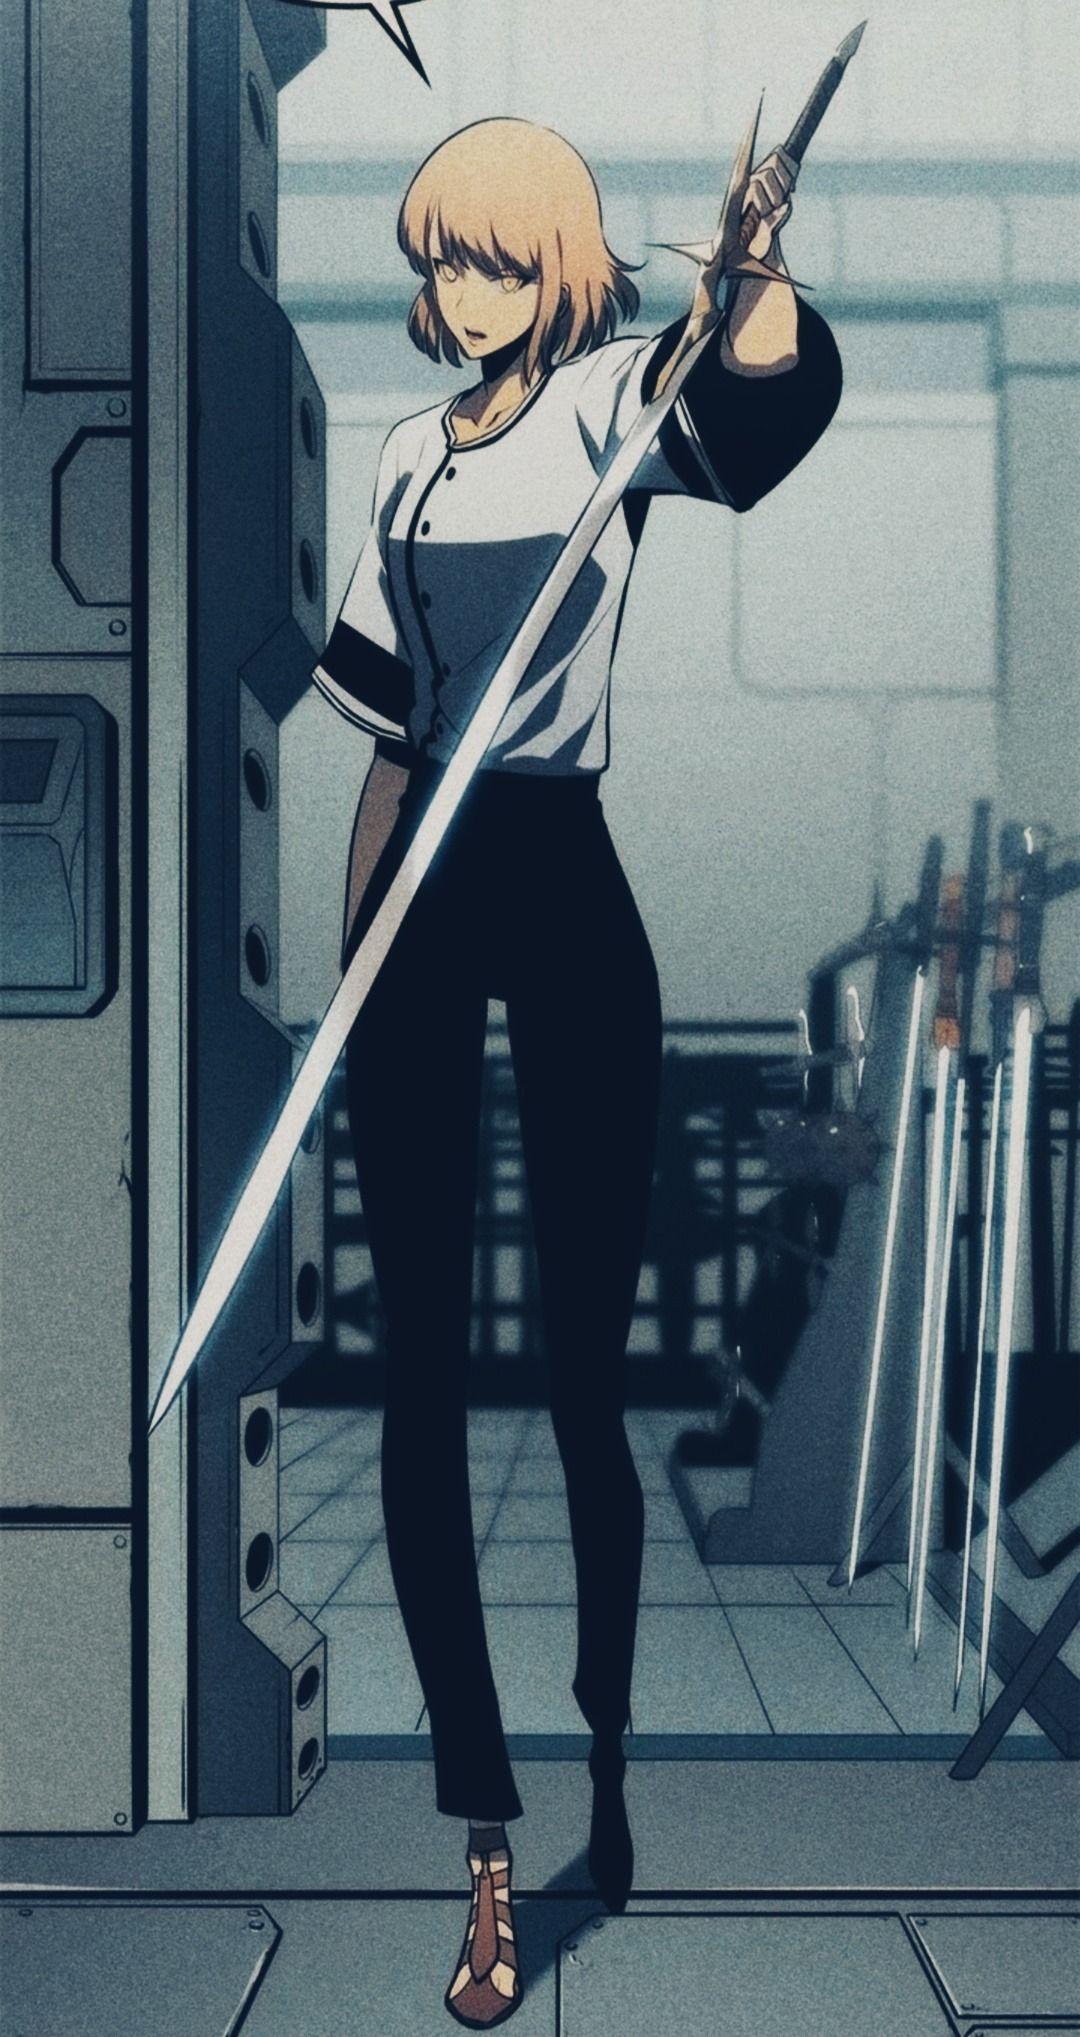 Cha Hae In Solo Leveling Anime Manhwa Manga